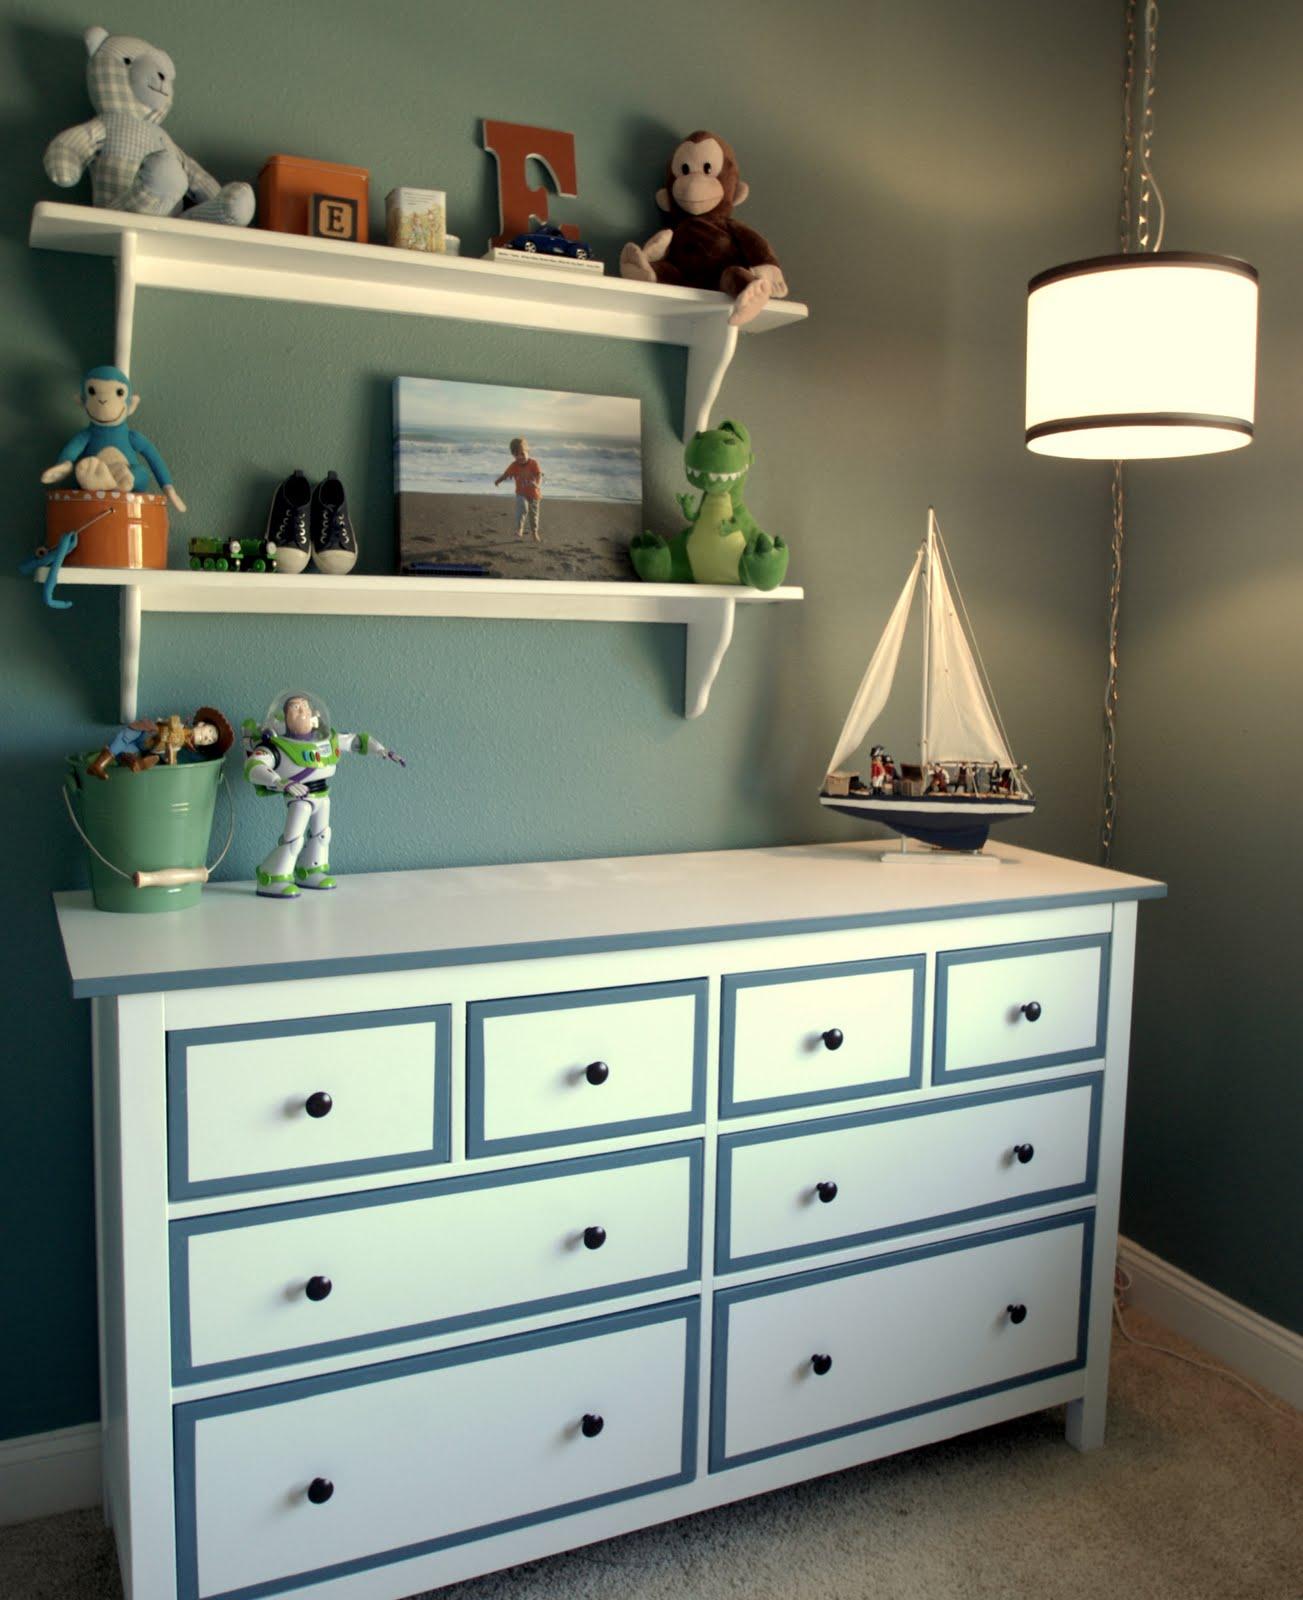 hemnes dresser revamp ikea hackers. Black Bedroom Furniture Sets. Home Design Ideas